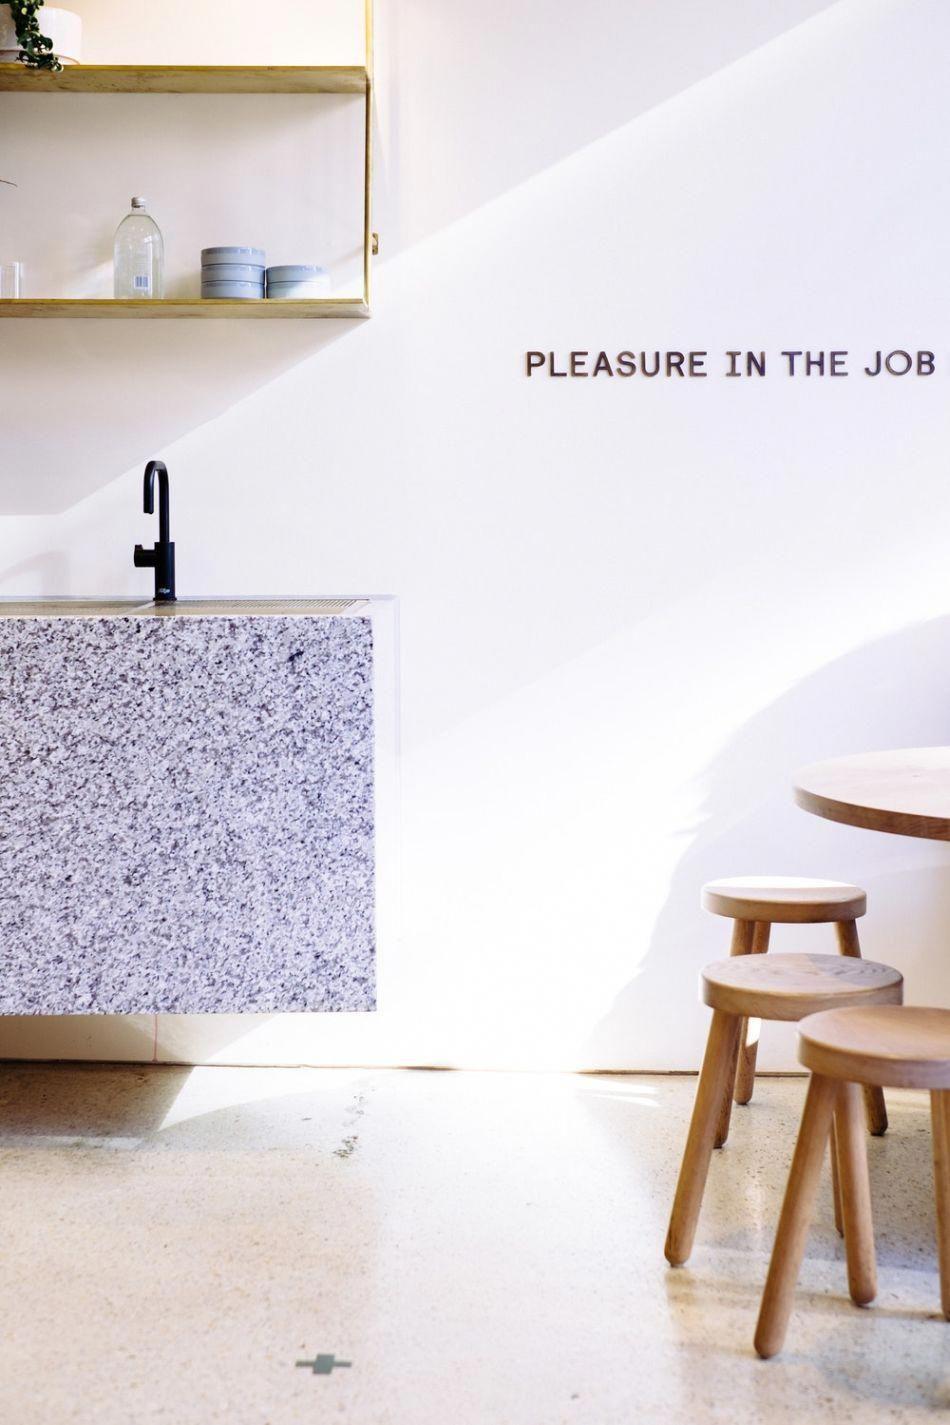 Office decoration ideas for boss birthday also inspiring designs rh pinterest